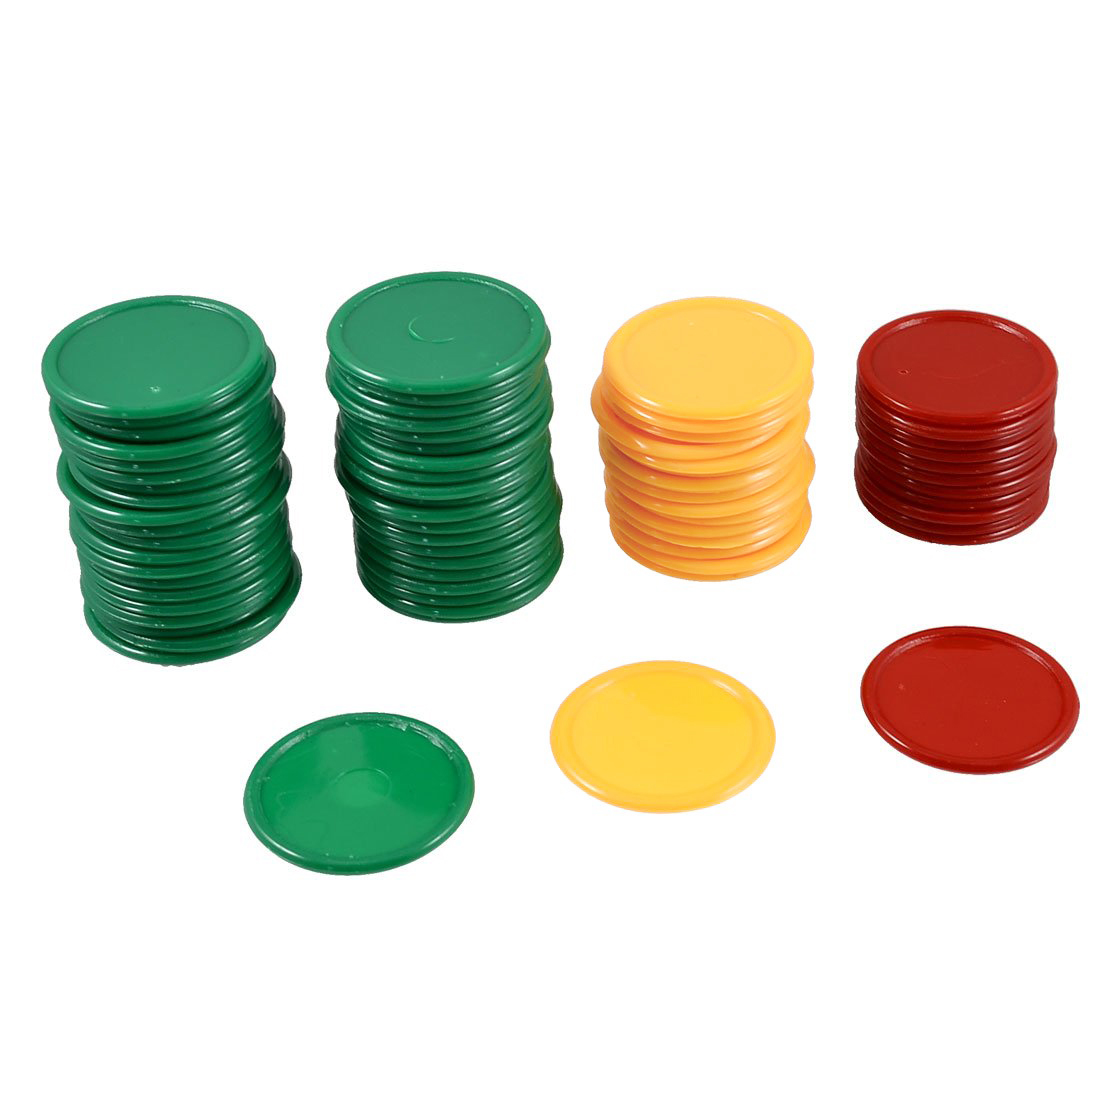 sz-lgfm-red-yellow-green-round-shaped-mini-font-b-poker-b-font-chips-lucky-game-props-69-pcs